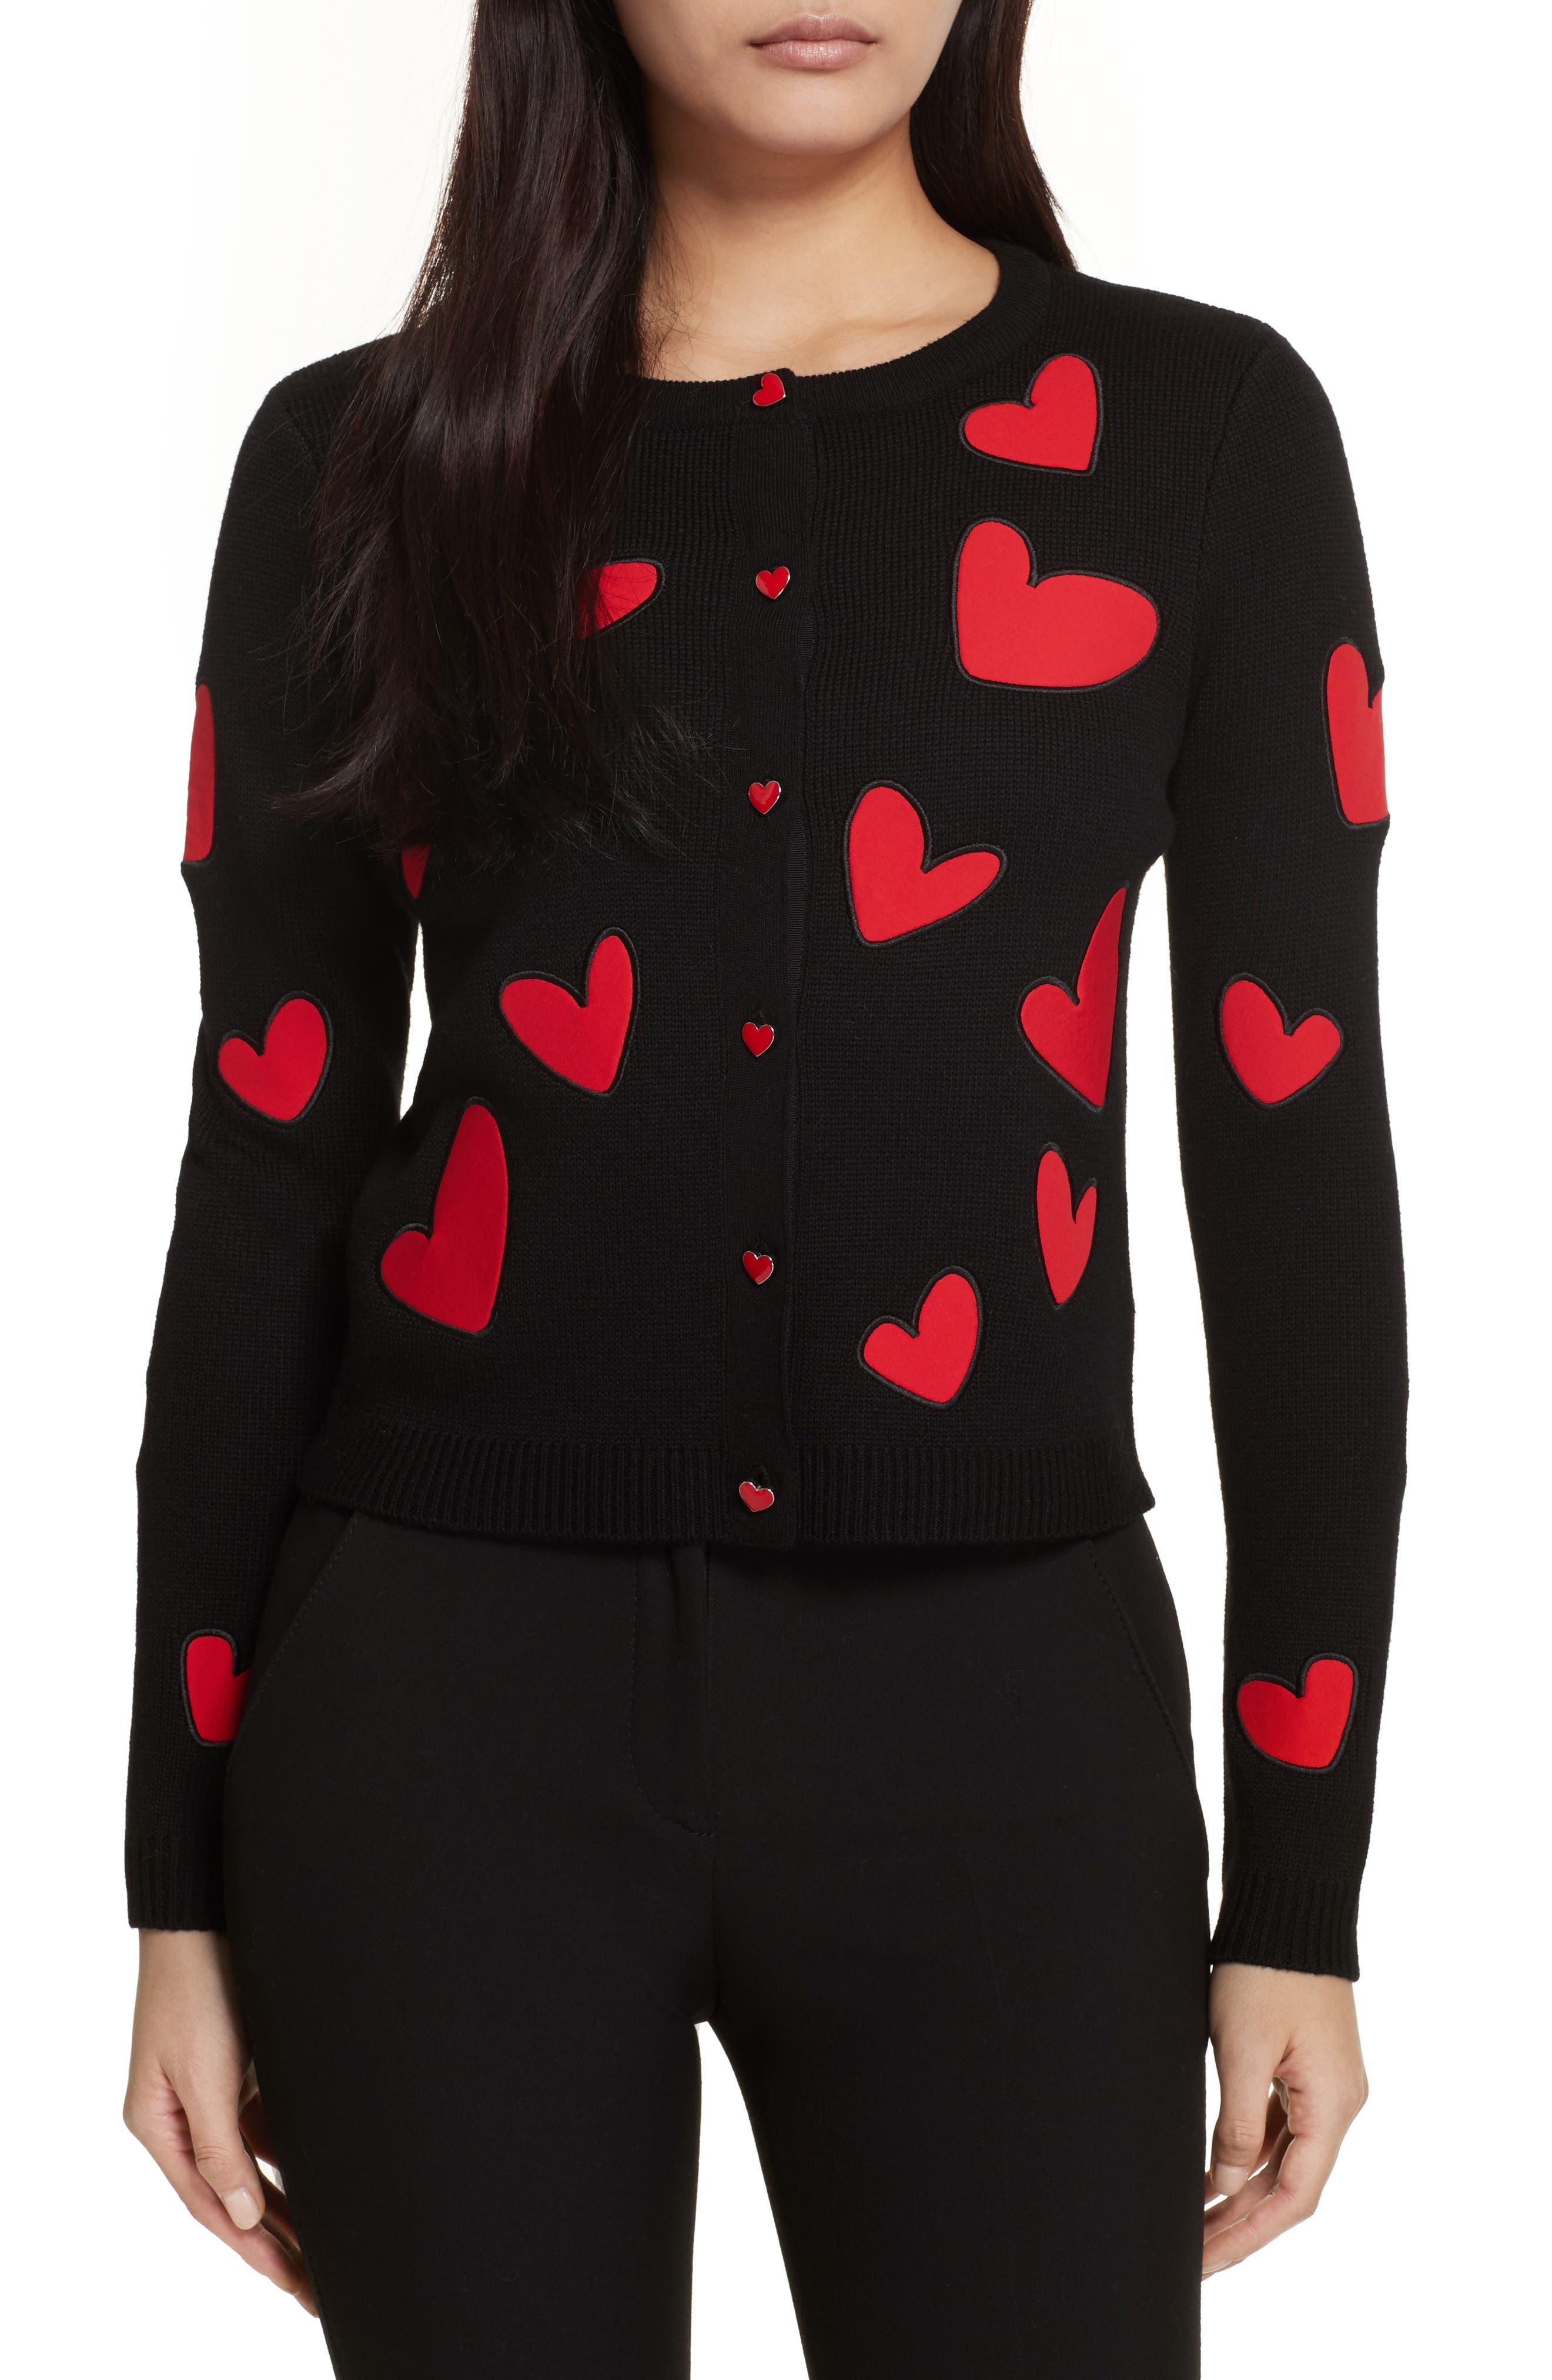 Ruthy Heart Appliqué Cardigan,                             Main thumbnail 1, color,                             Black/ Apple